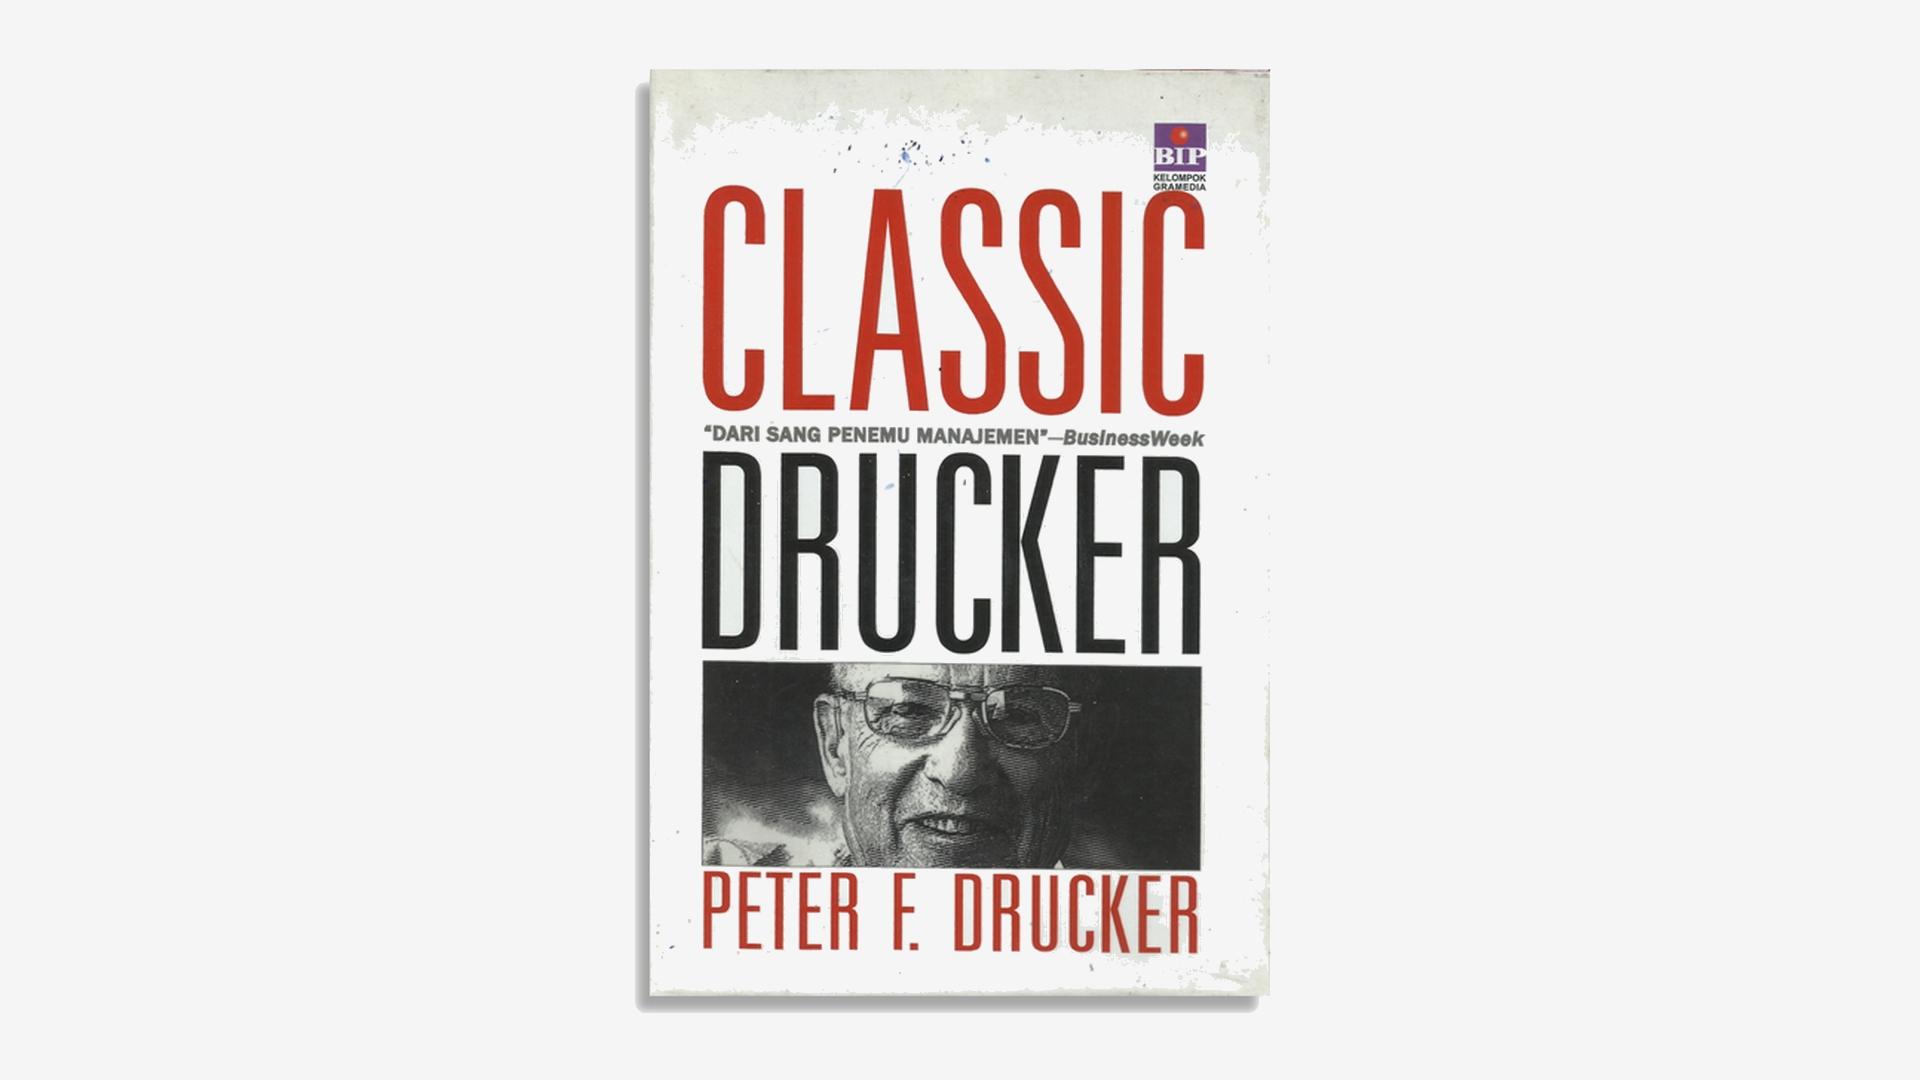 Peter F. Drucker – Classic Drucker